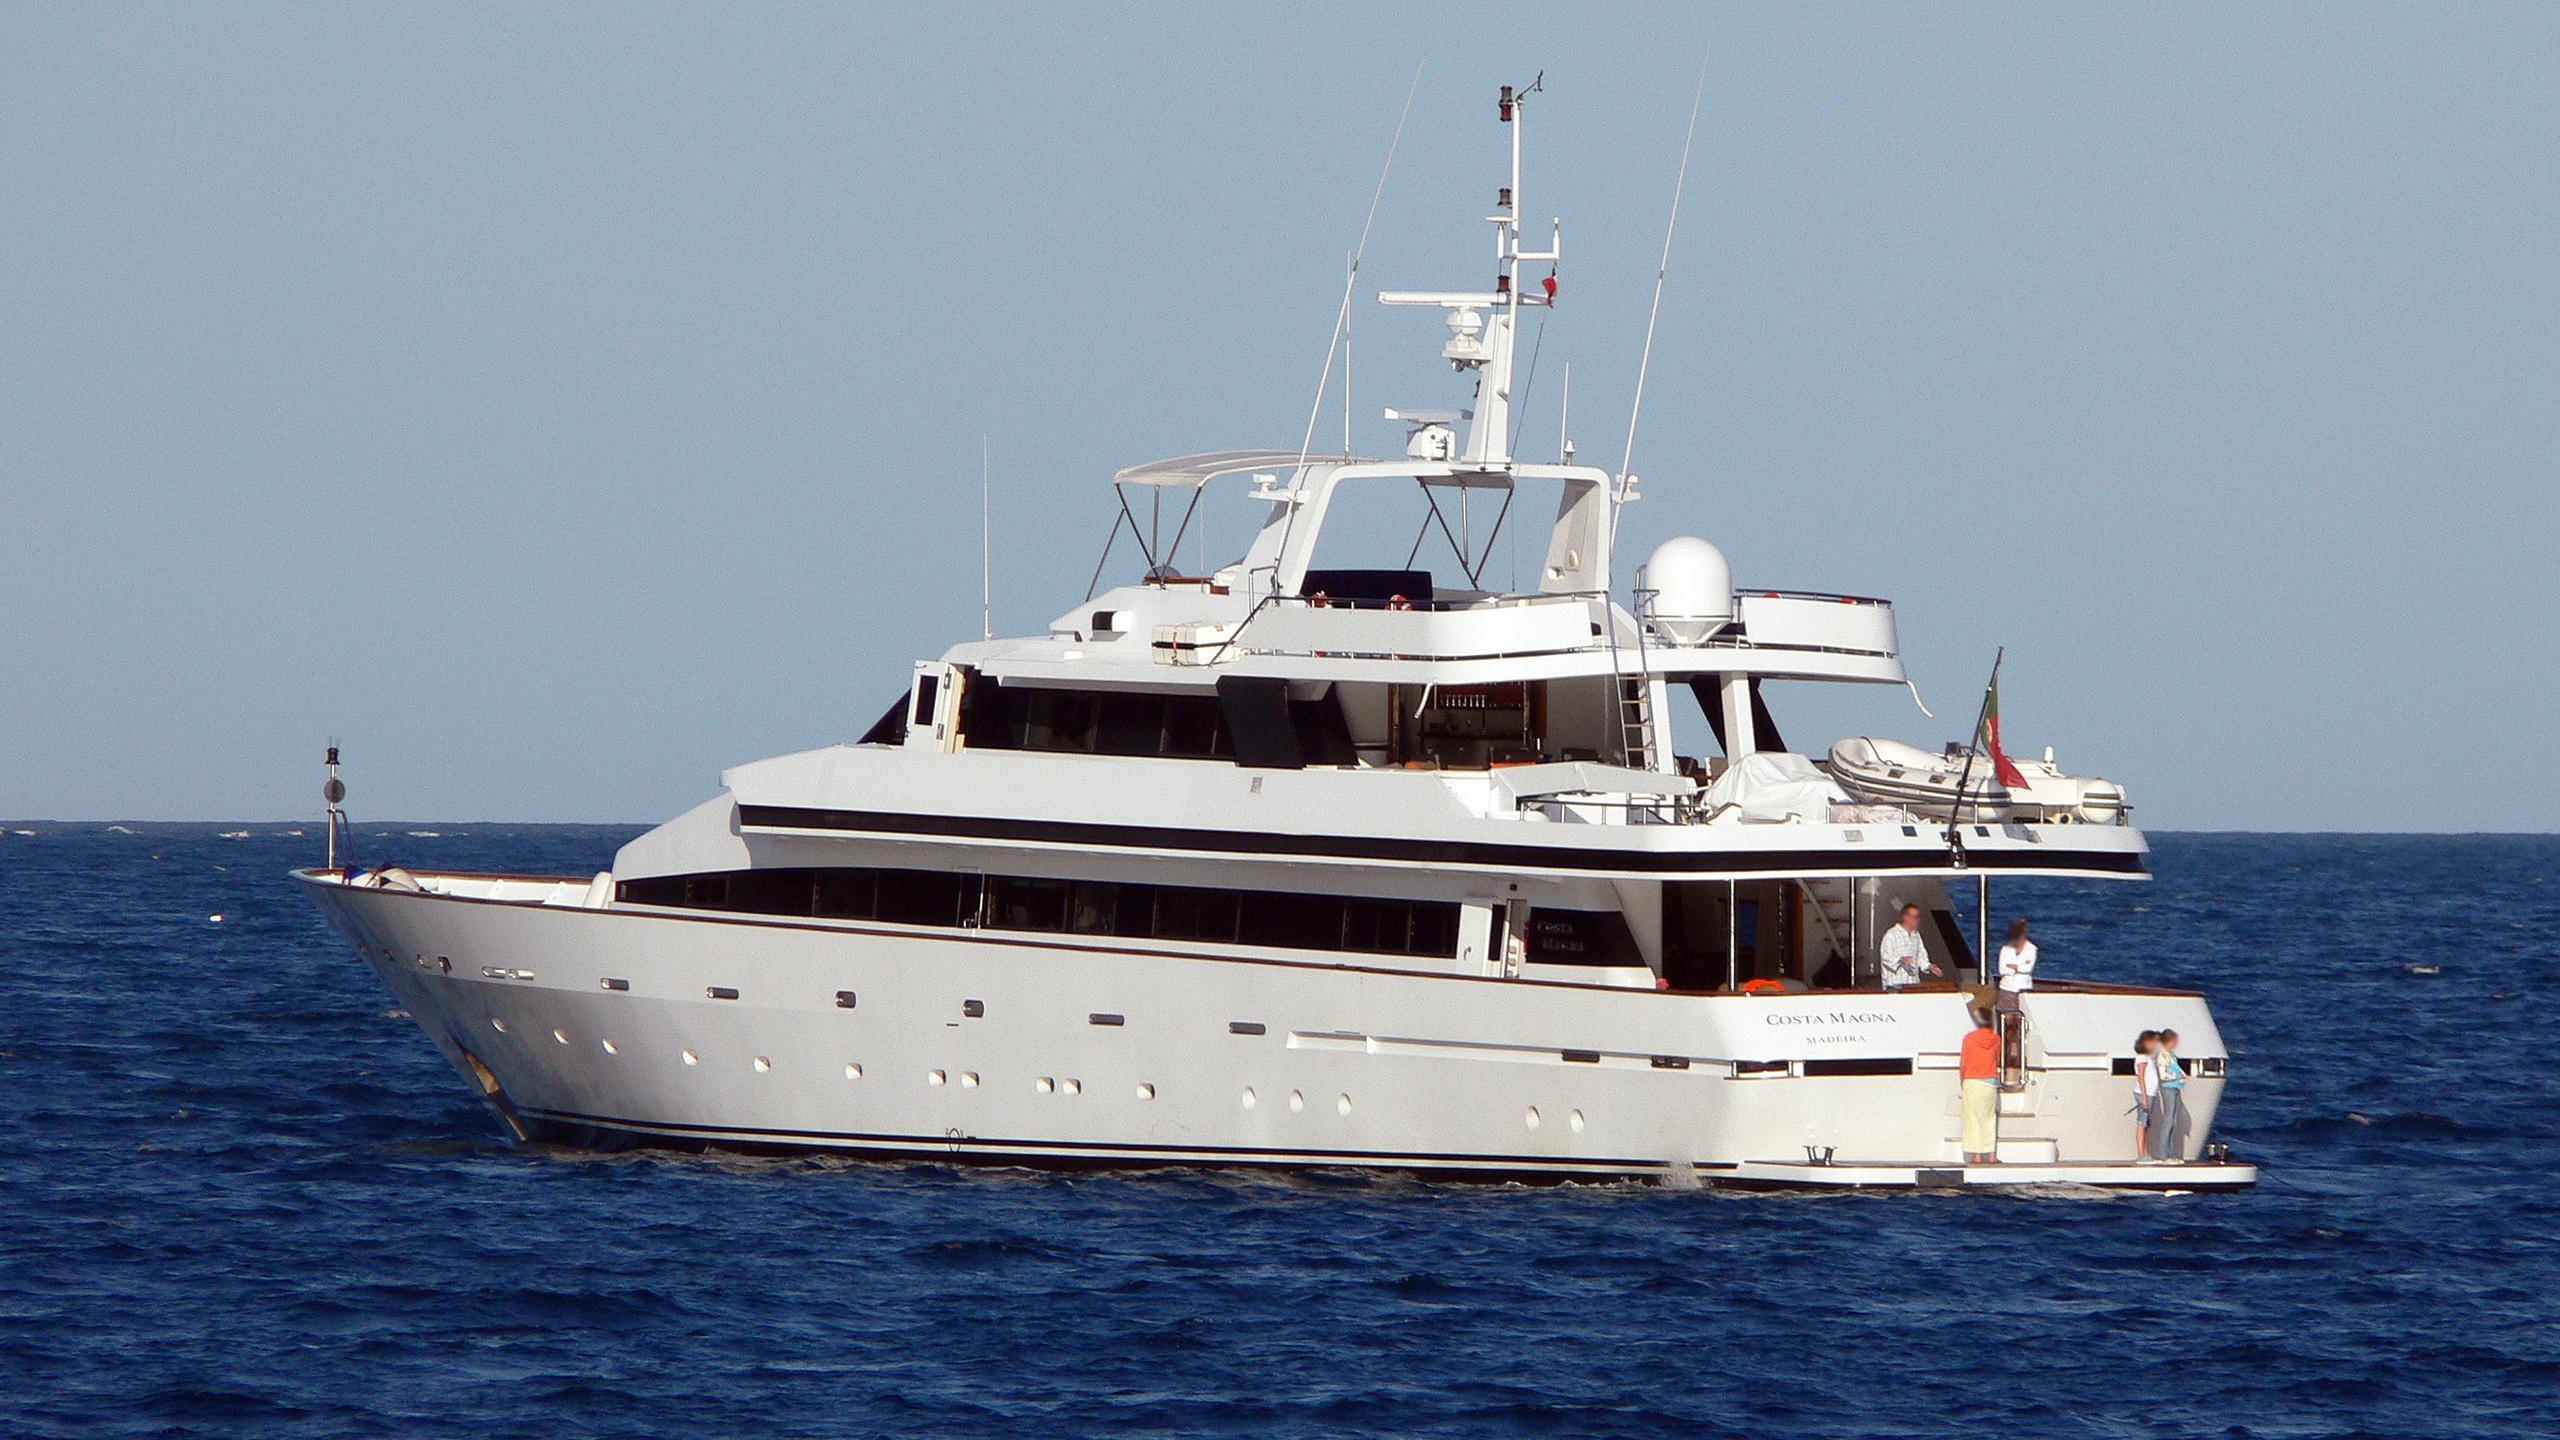 costa-magna-motor-yacht-proteksan-1986-44m-stern